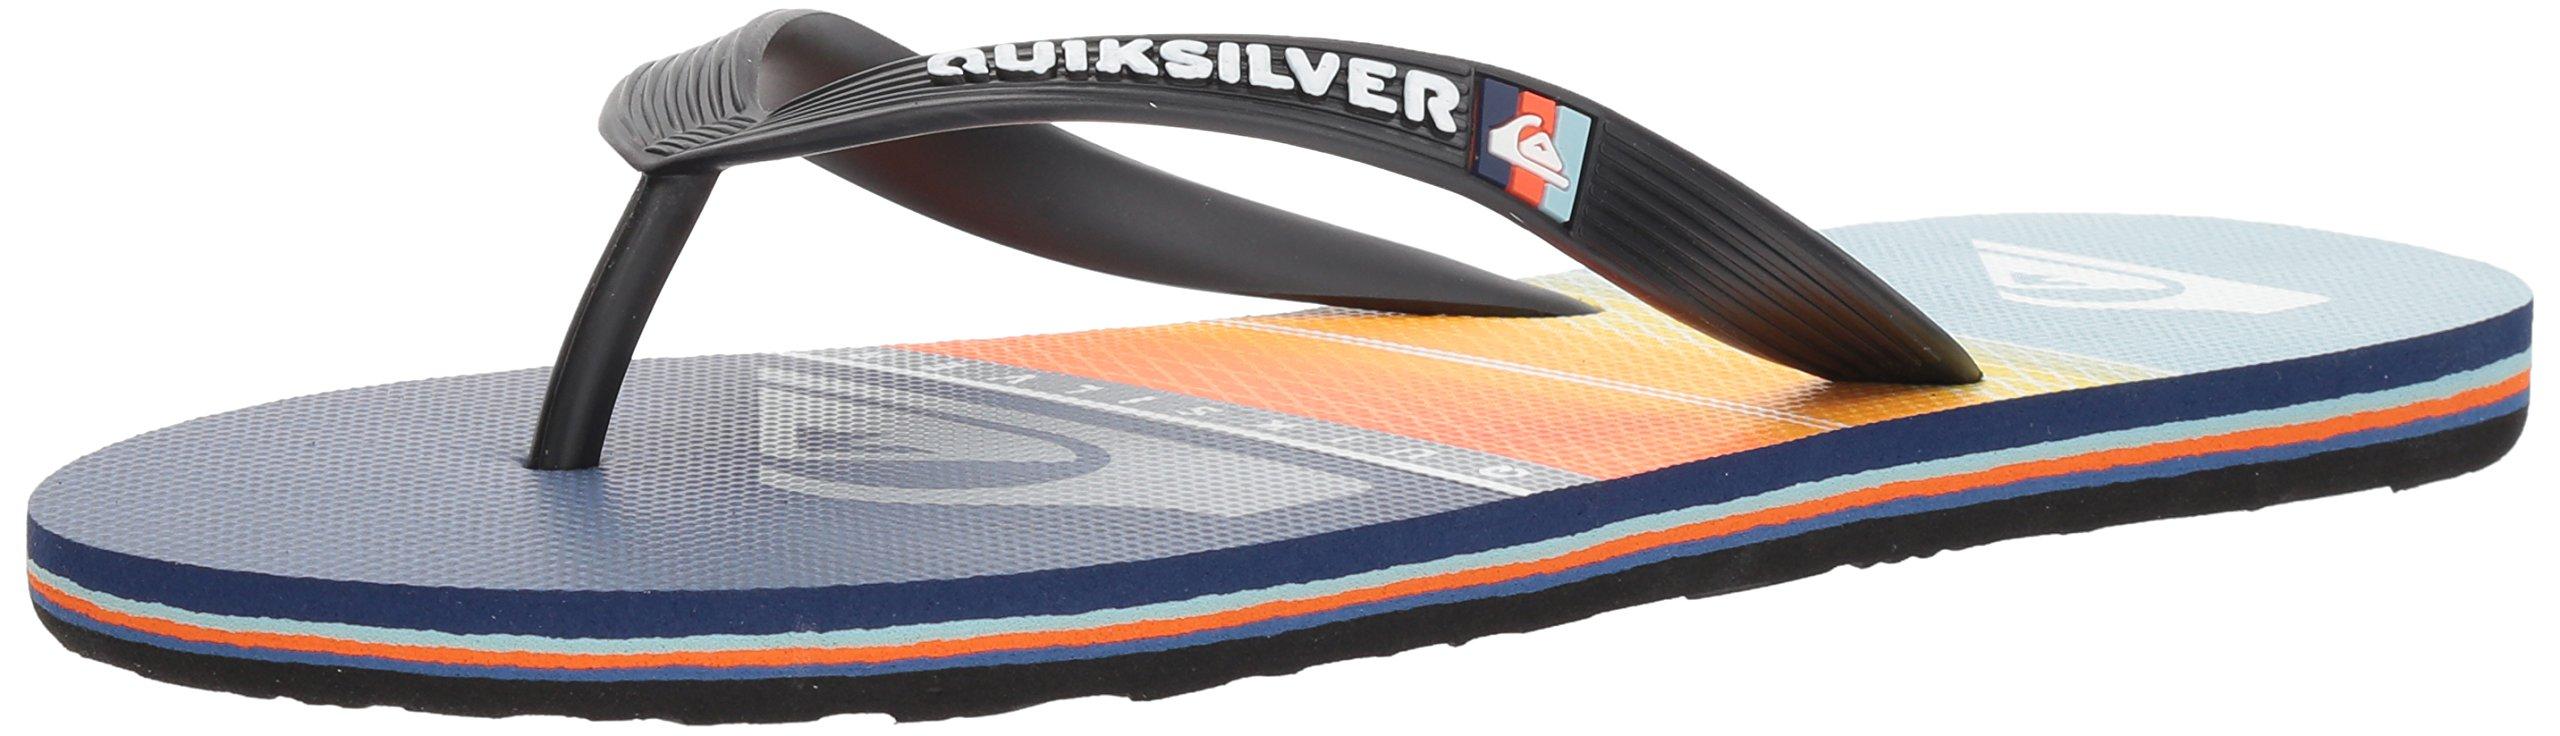 Quiksilver Men's Molokai Highline Slab Sandal, Black/Orange/Blue, 13 M US